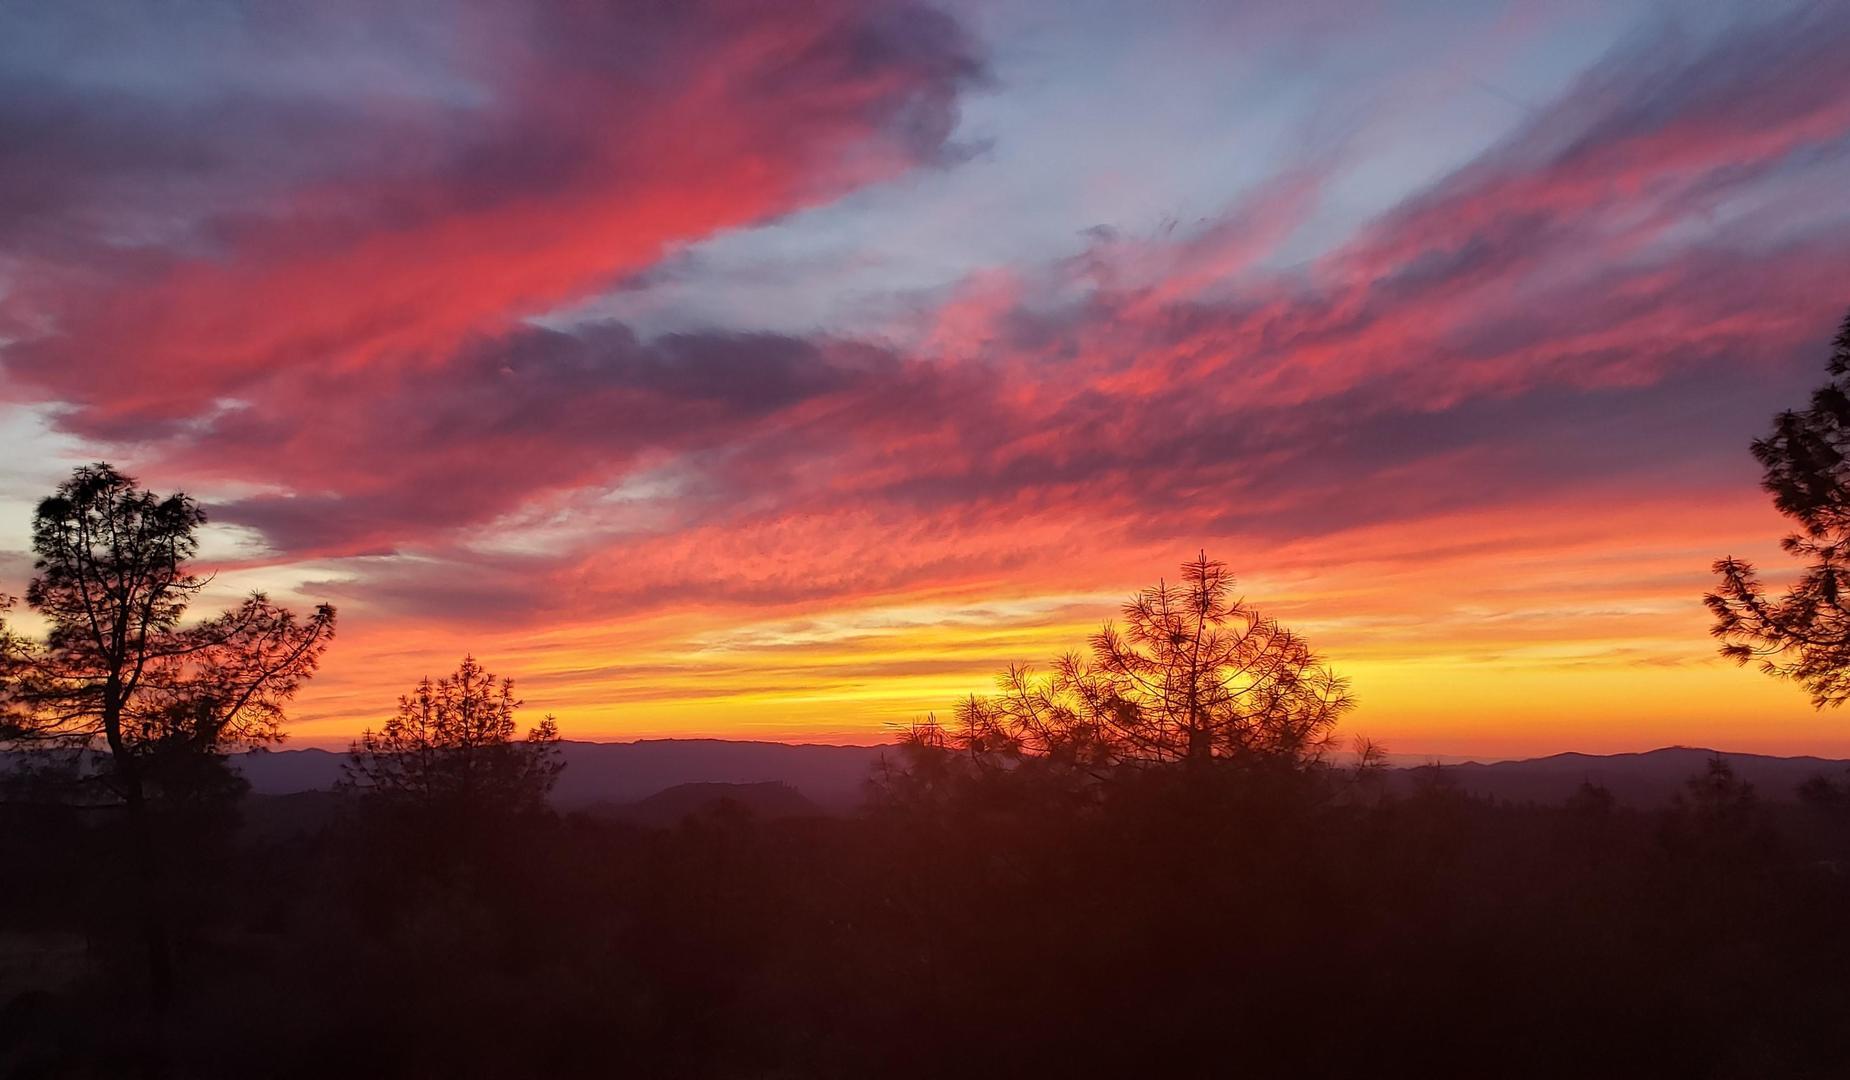 Sunset over Murphys